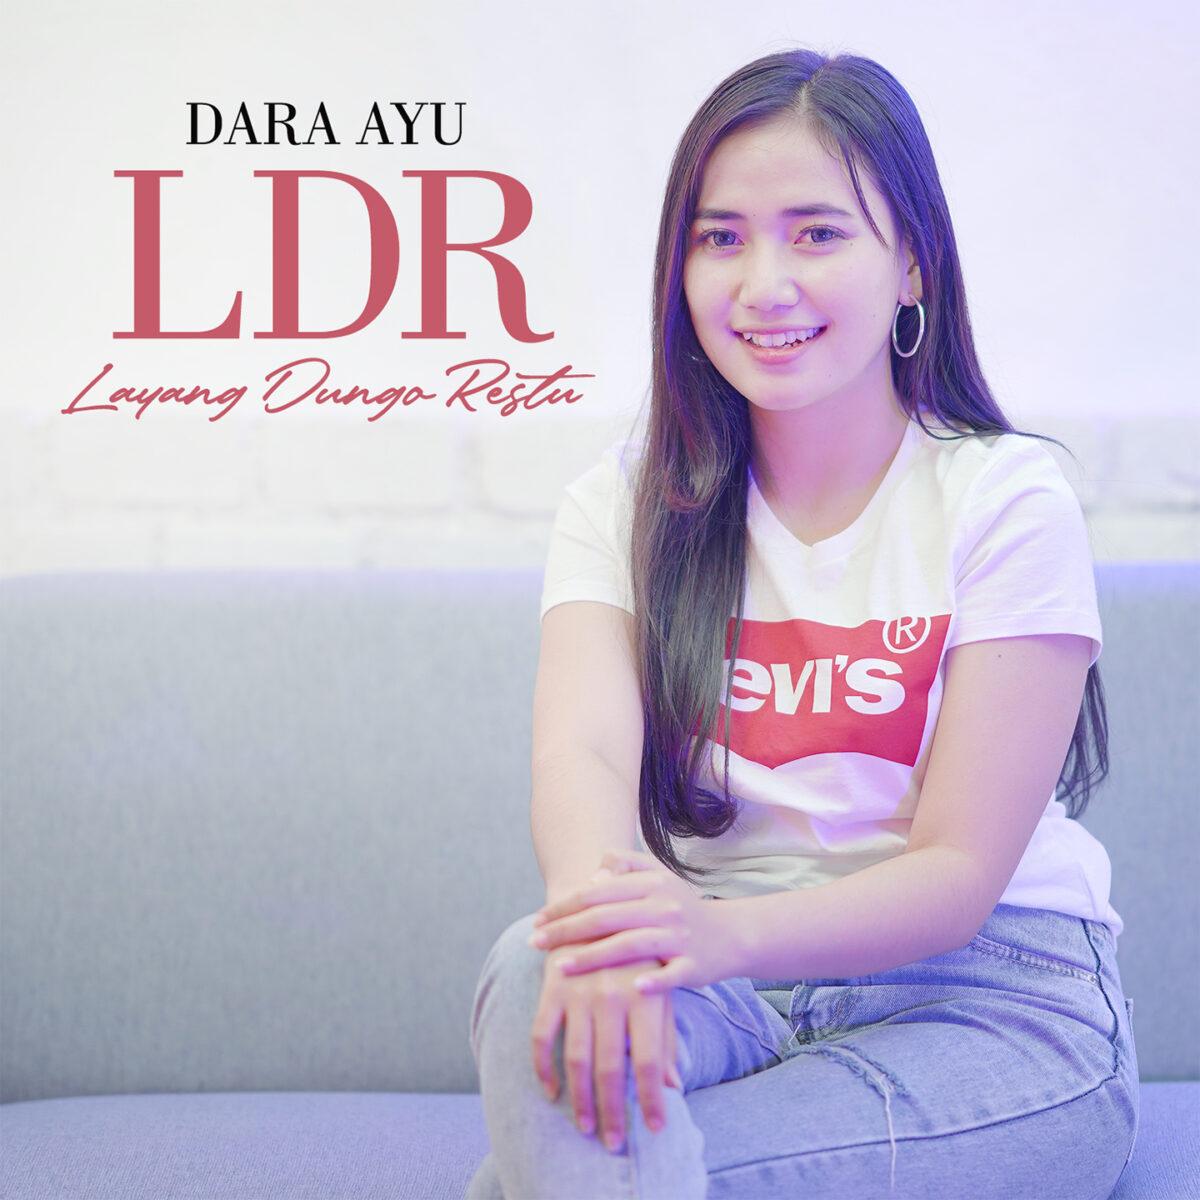 Dara Ayu Merilis Lagu Viral berjudul Layang Dungo Restu alias LDR !